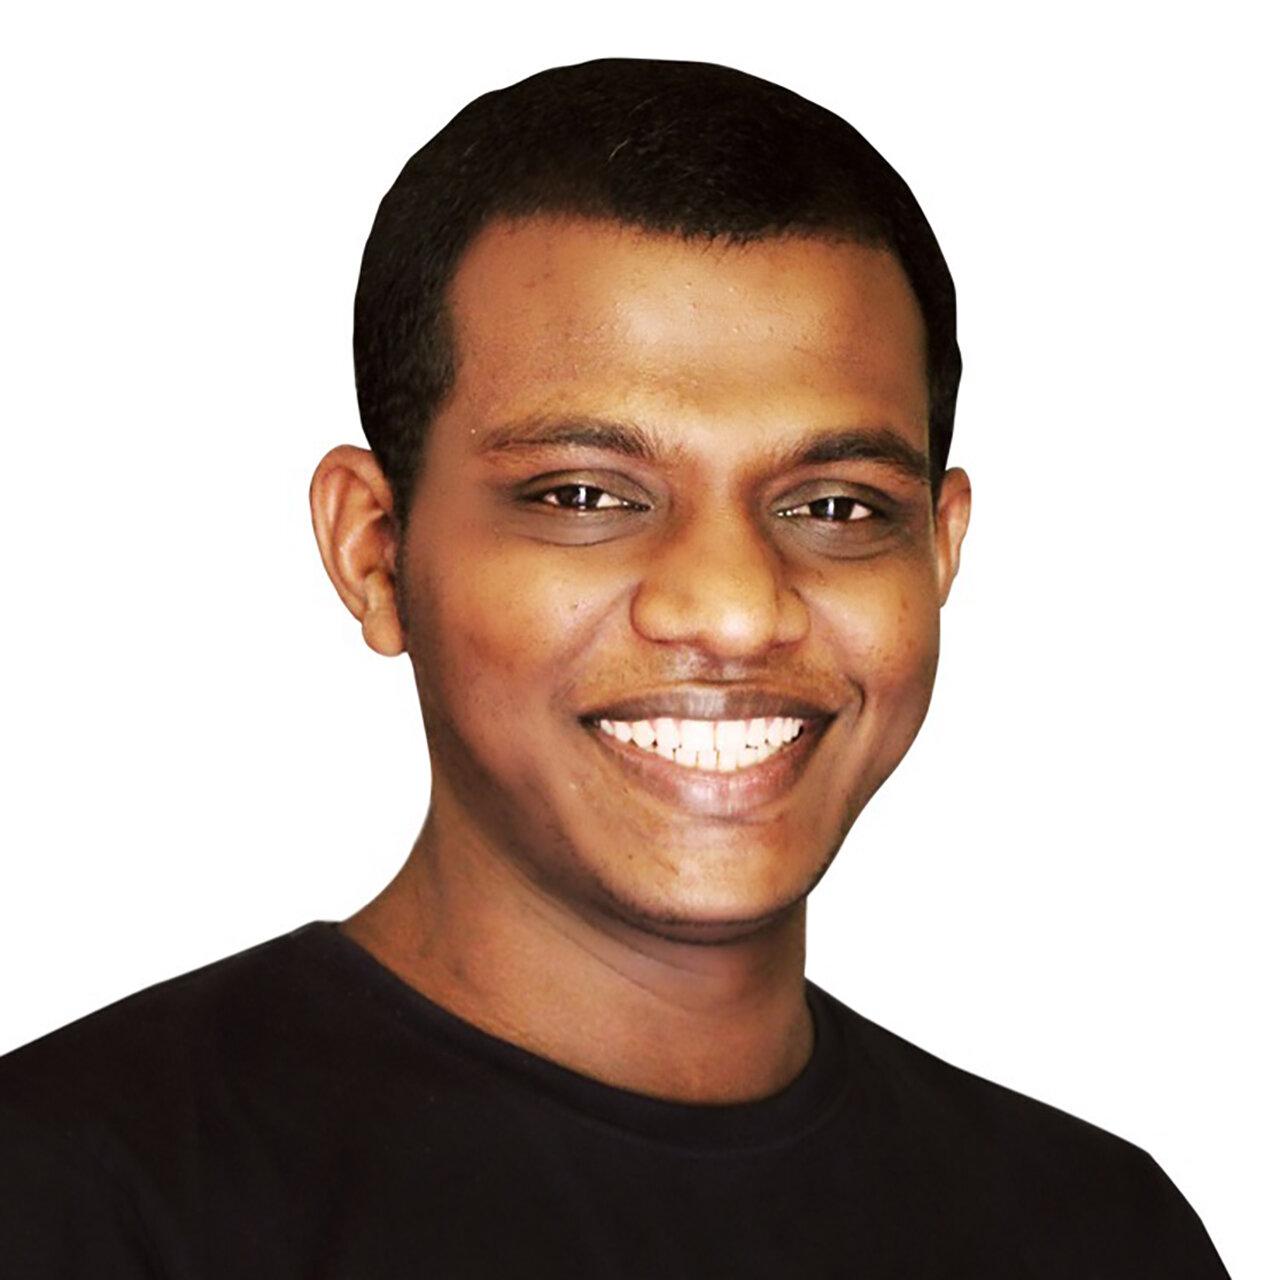 BENISLOS THUSHAN Jaffna, Sri Lanka @EverydaySriLanka  @benislosthushan